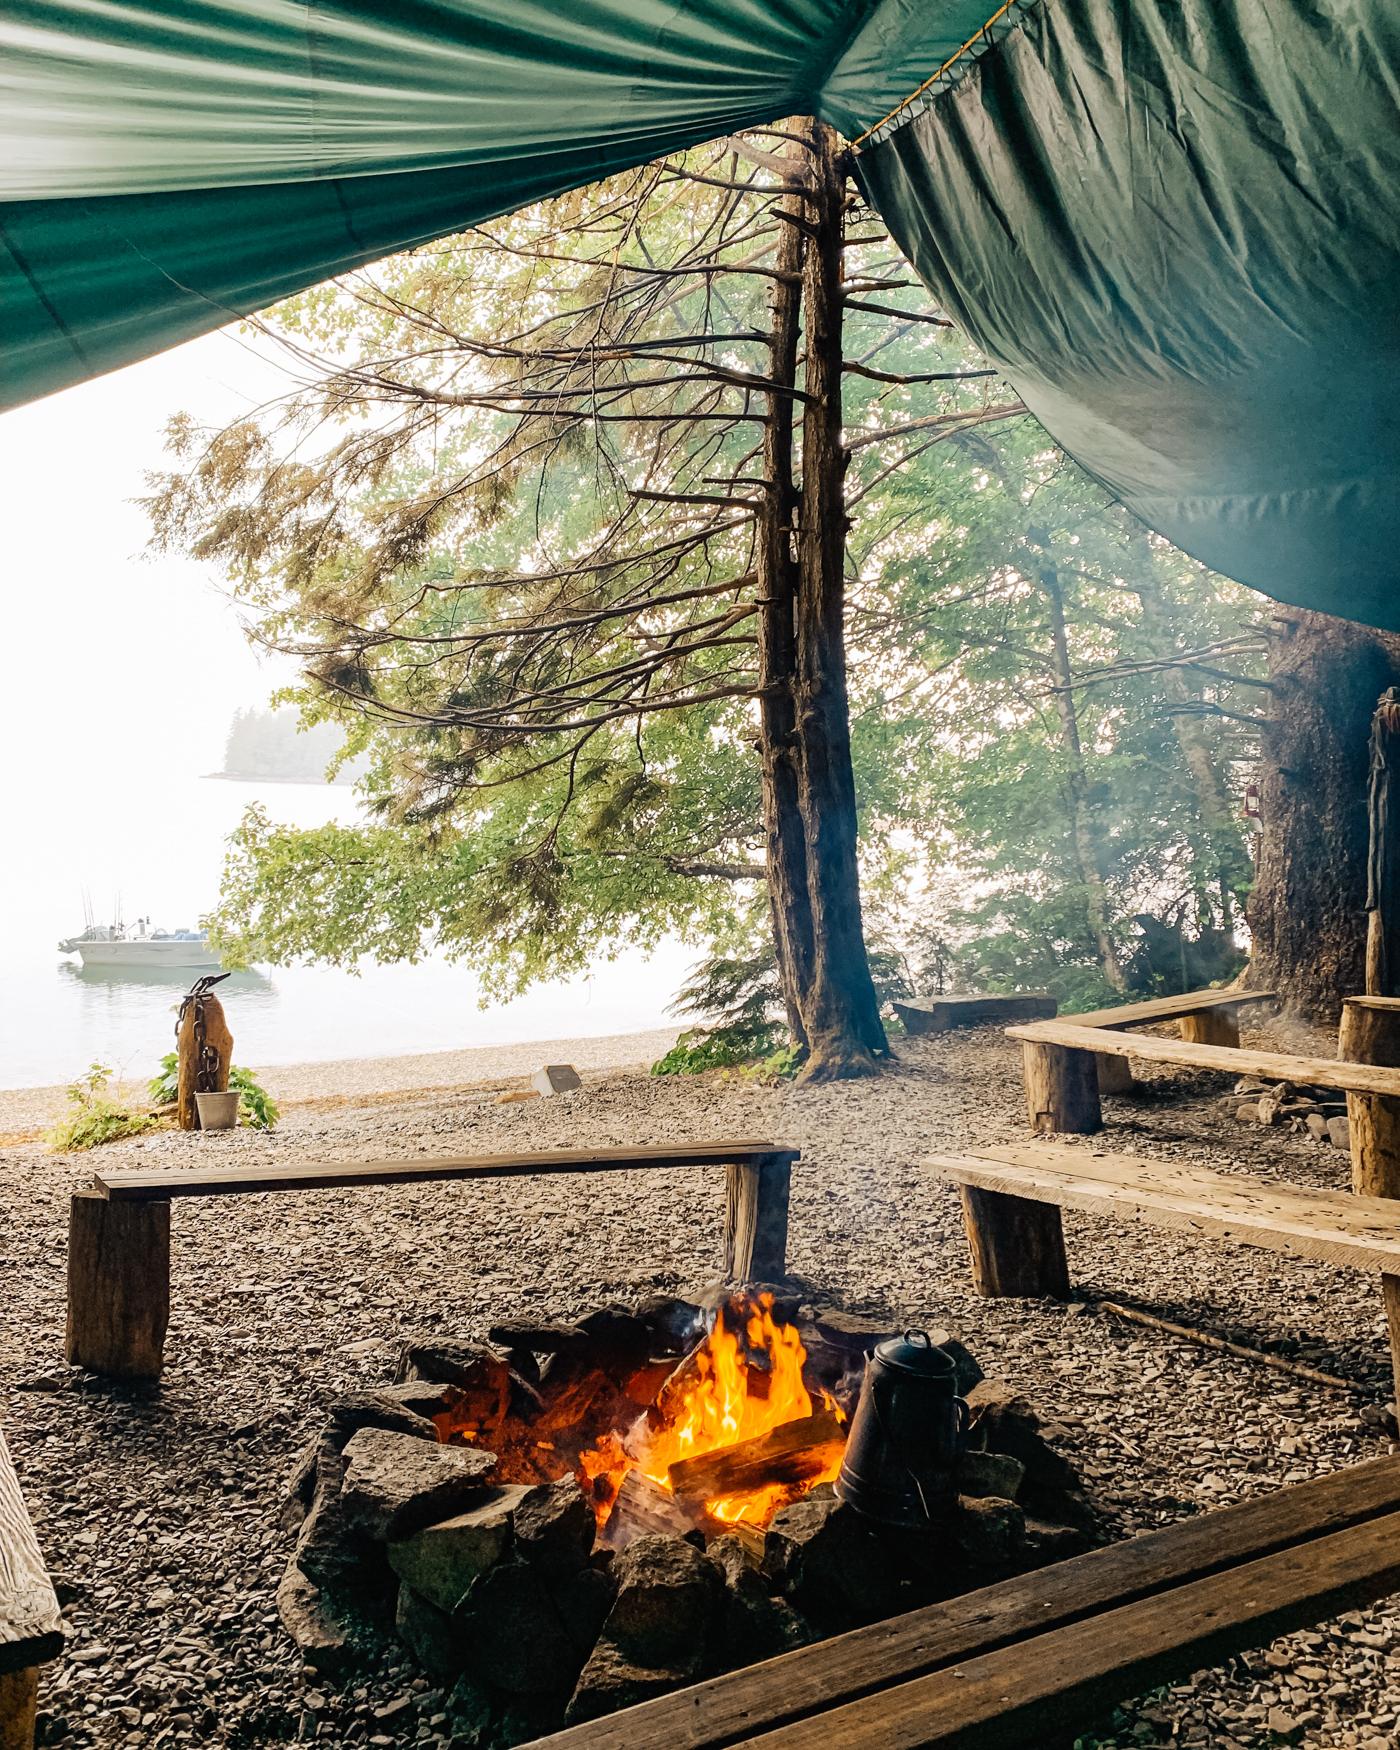 Our beach campfire in Ketchikan, Alaska